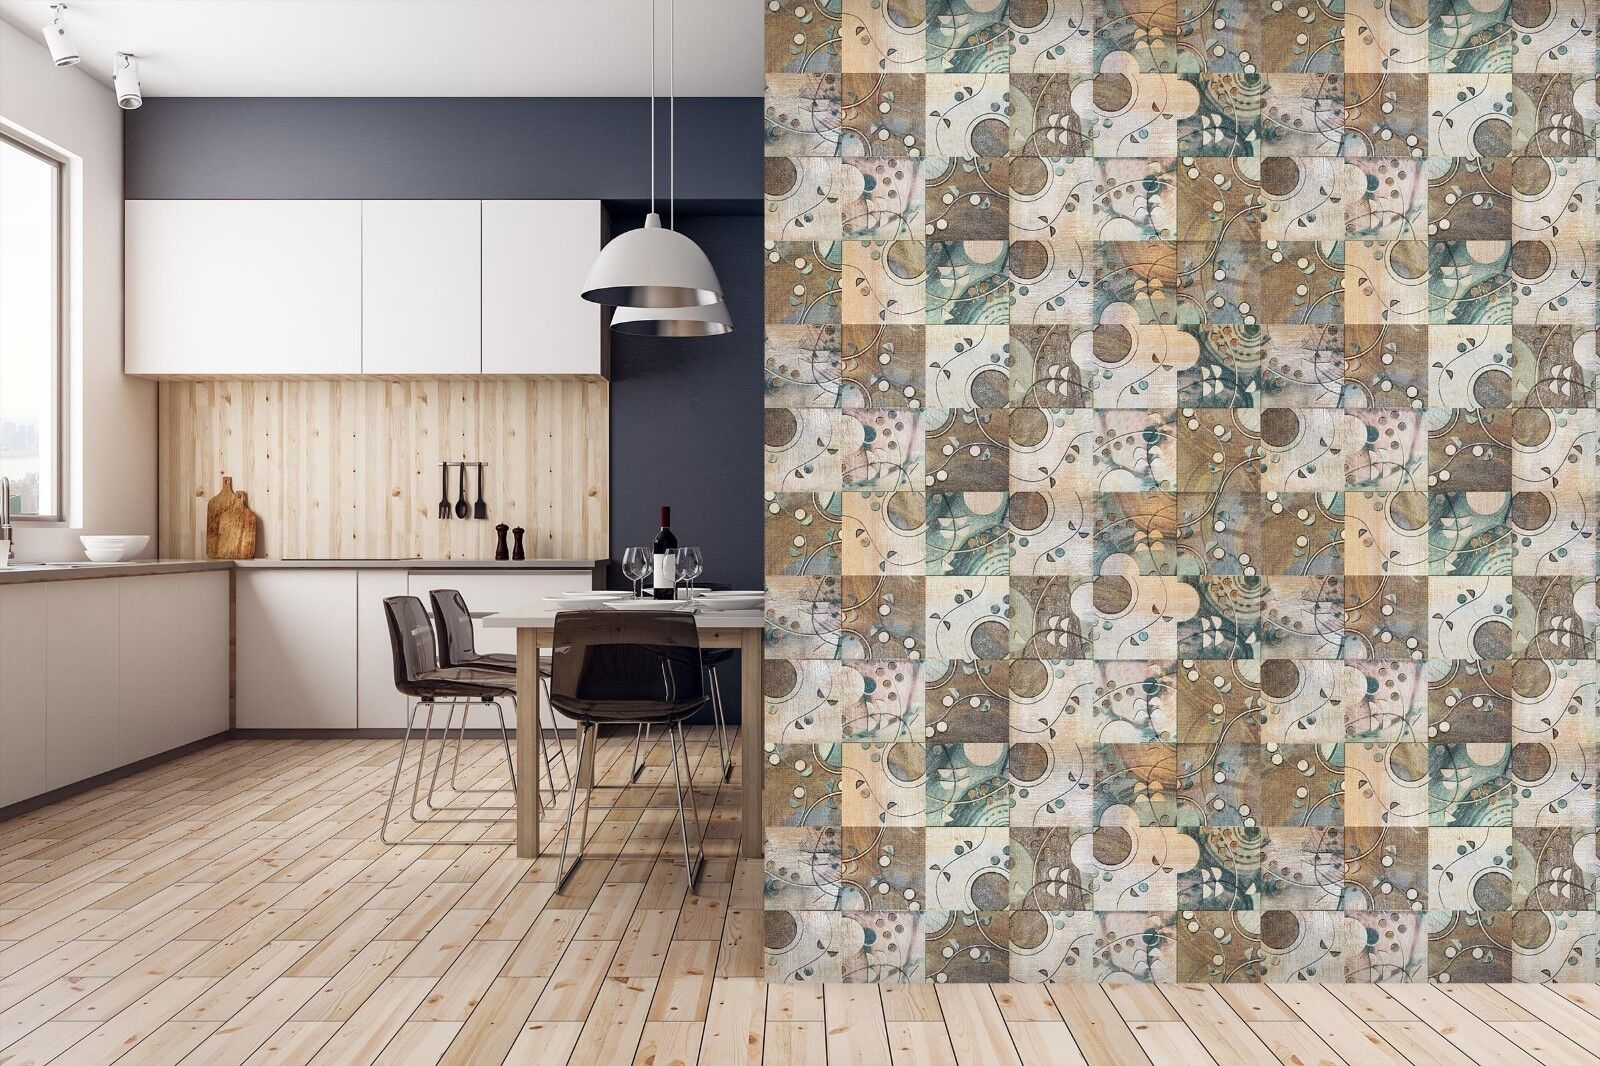 3D Irregular Pattern 7 Texture Tiles Marble Wall Paper Decal Wallpaper Mural AJ